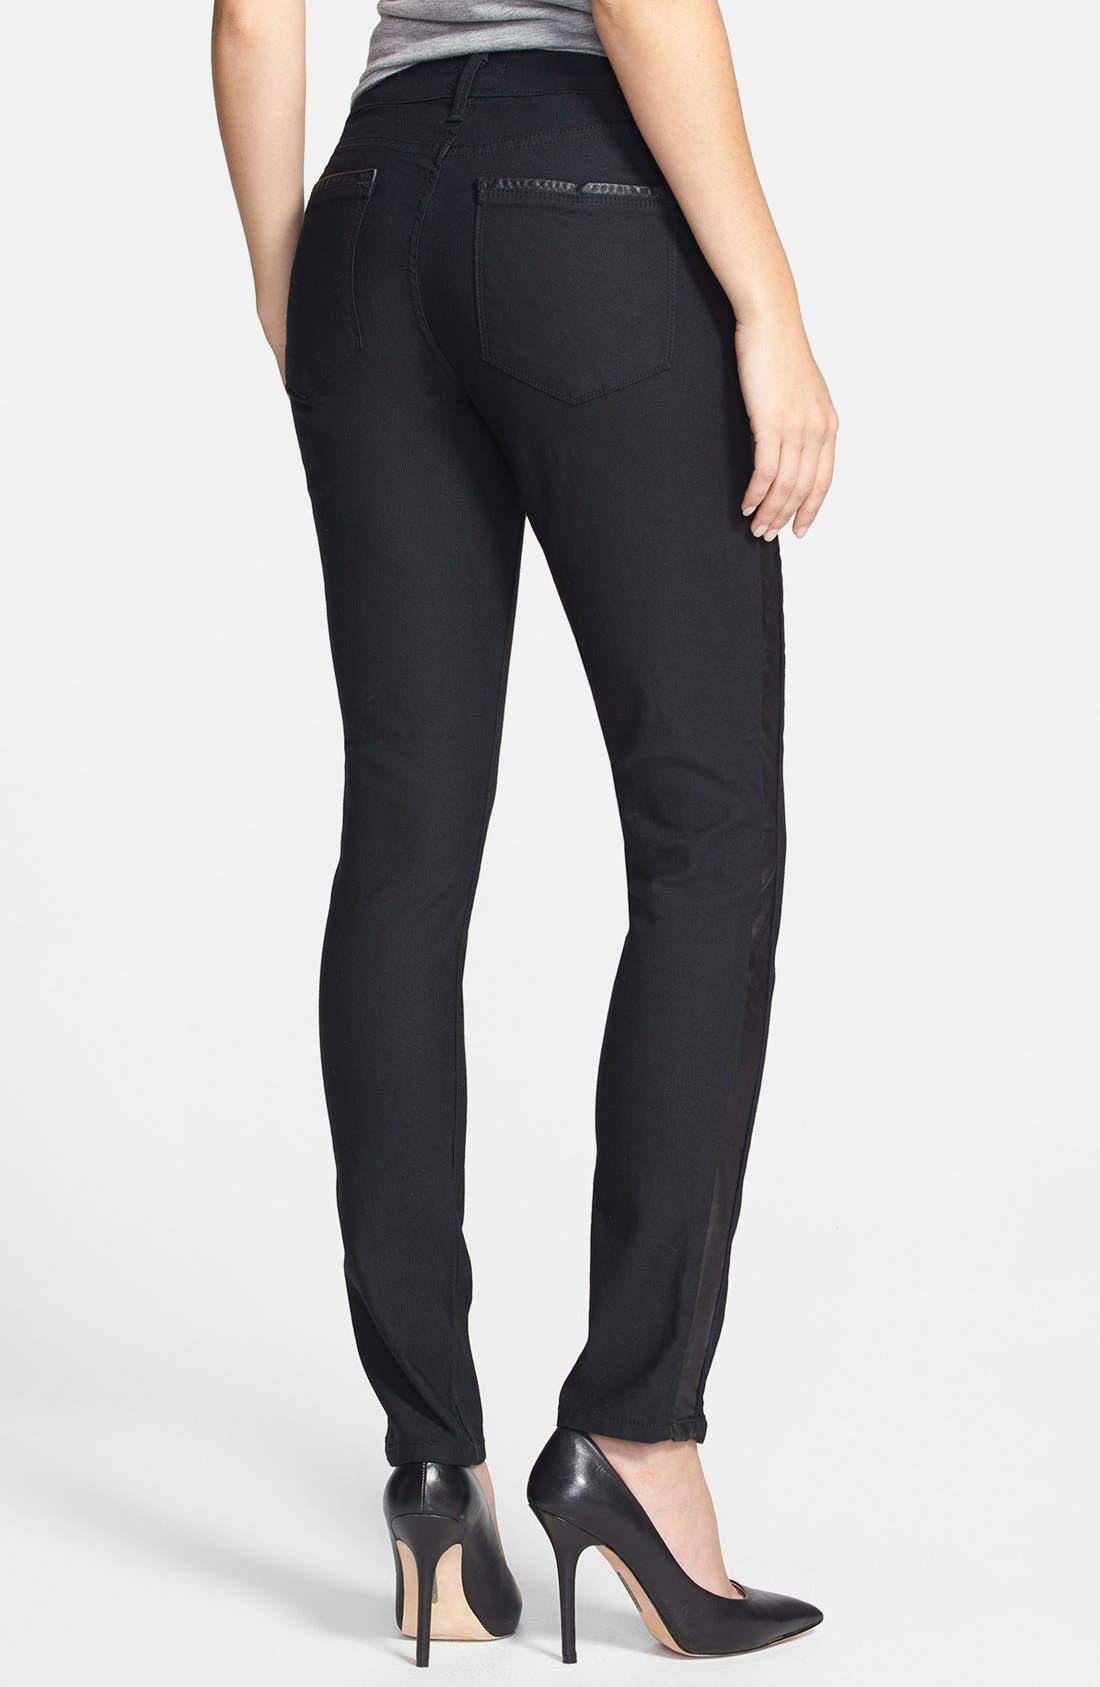 'Megan' Faux Leather Trim Stretch Skinny Jeans,                             Main thumbnail 1, color,                             460